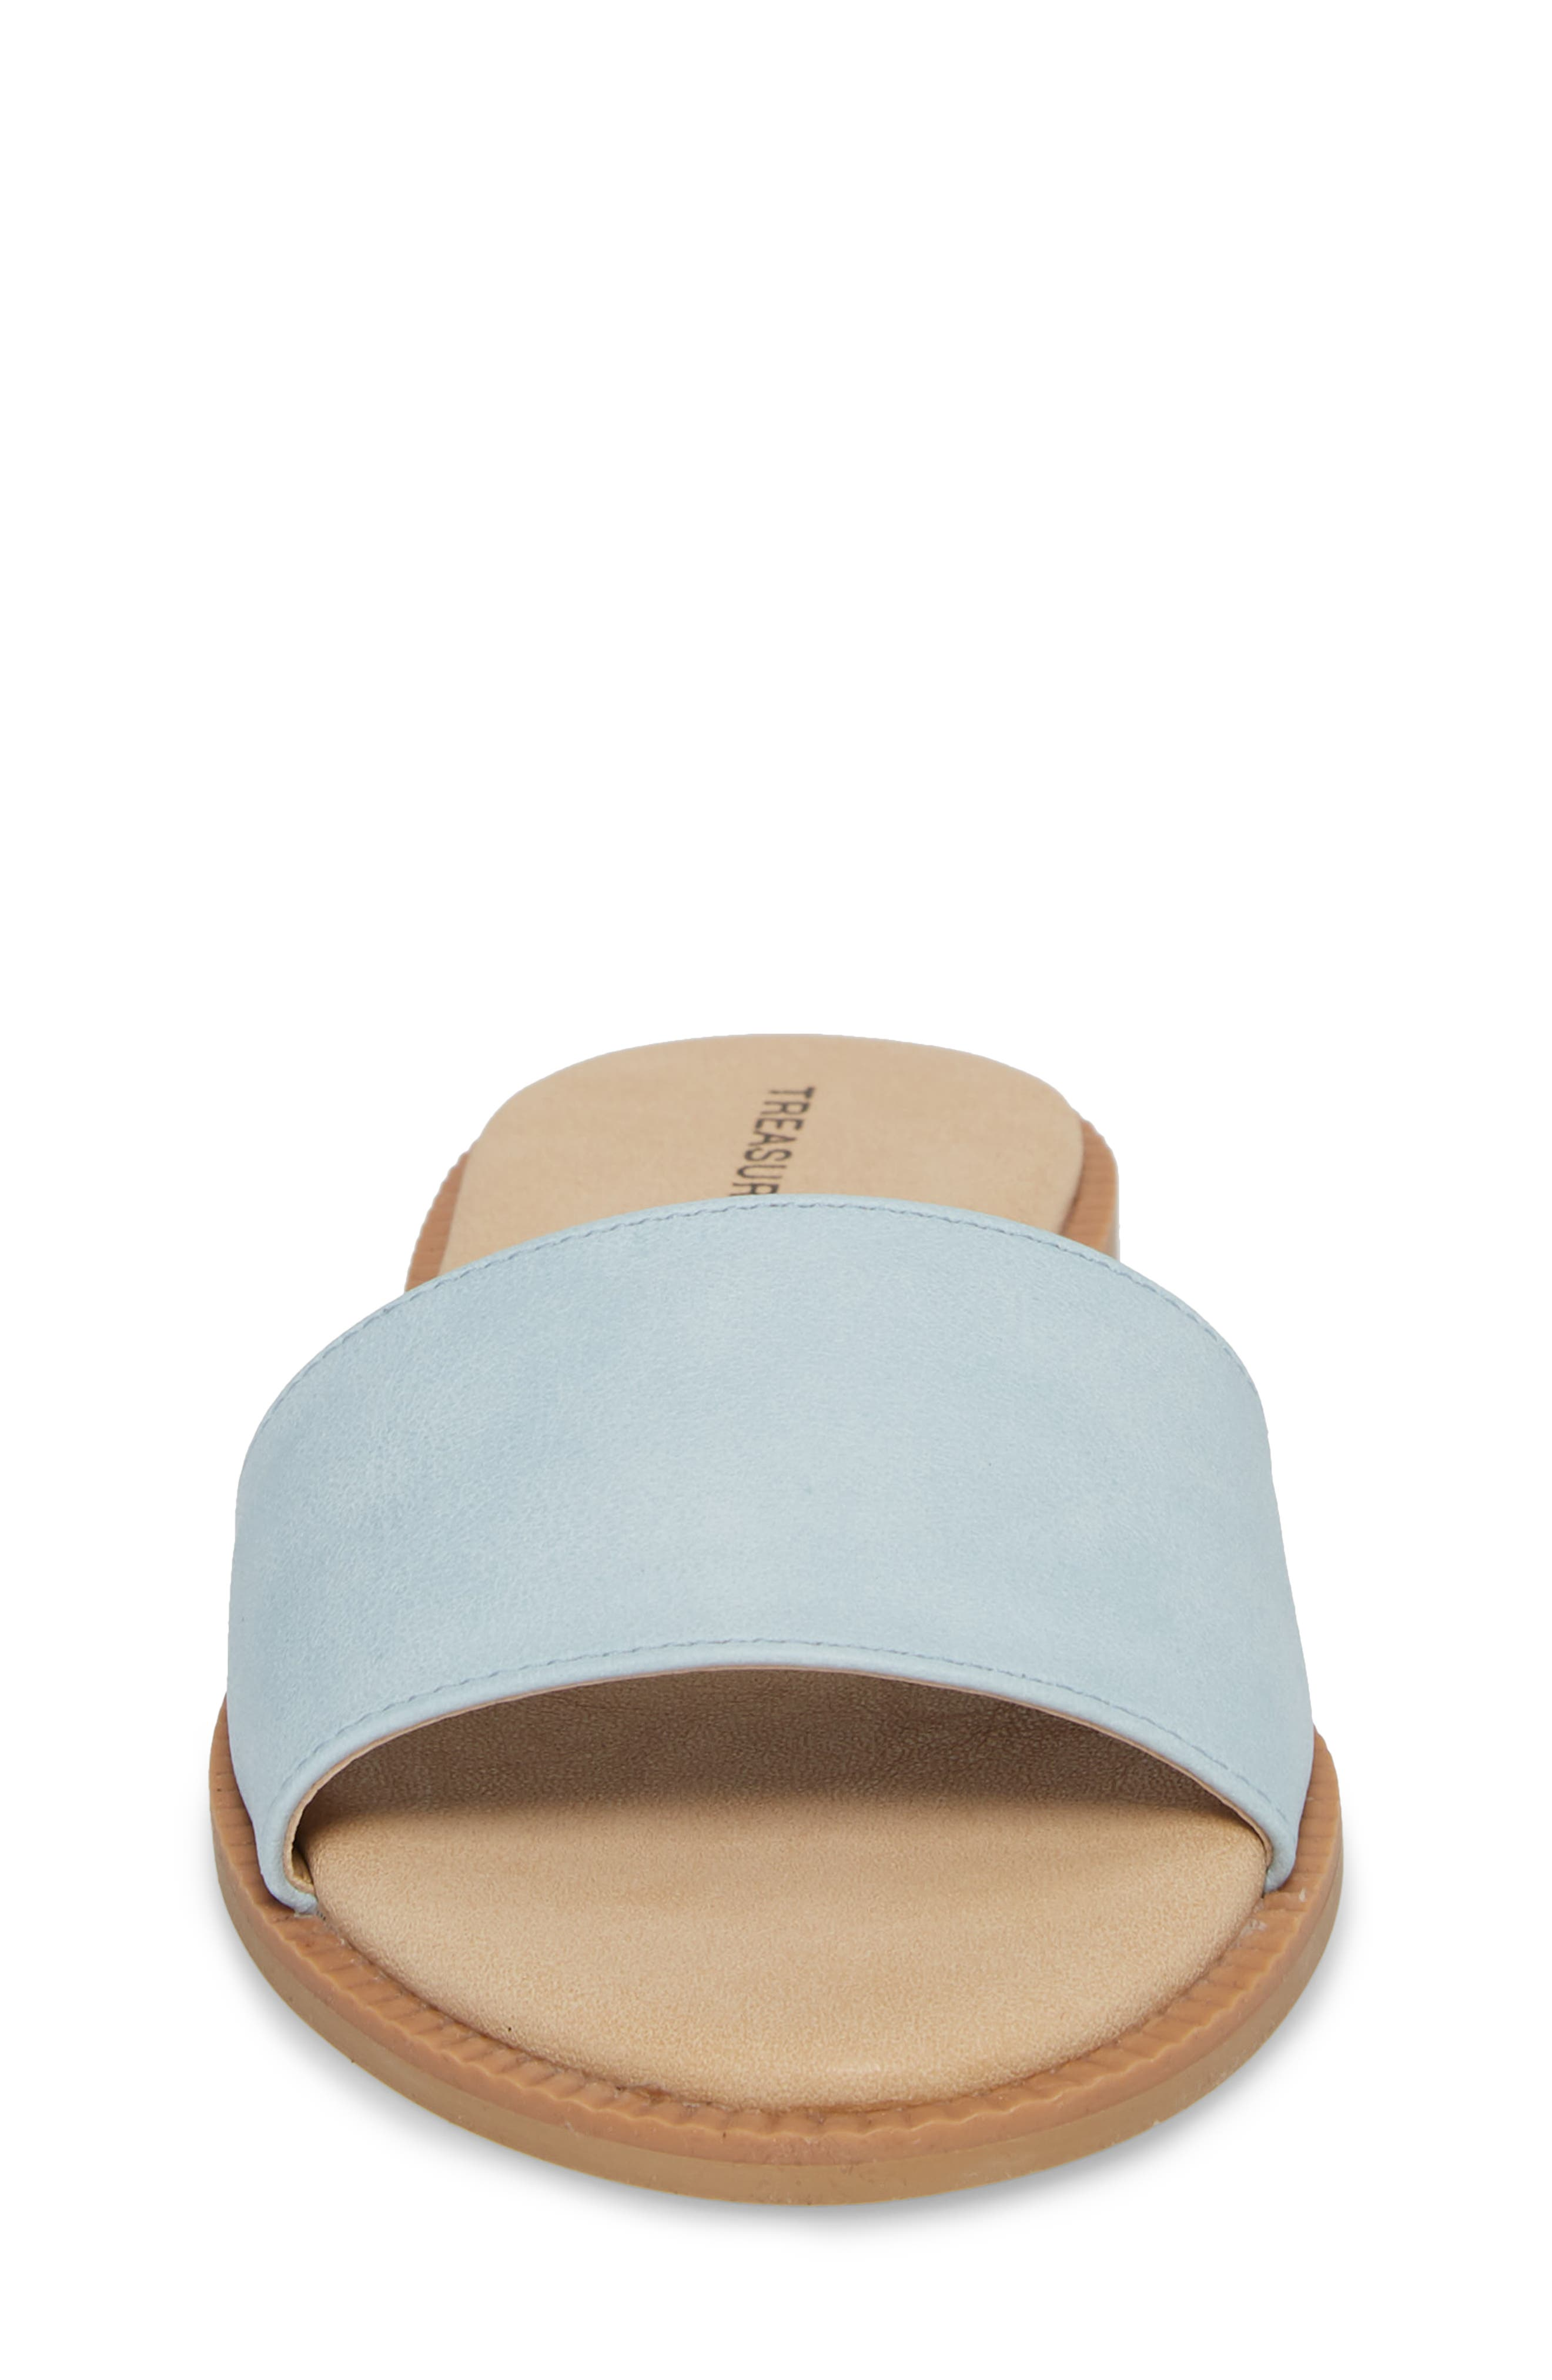 Mia Slide Sandal,                             Alternate thumbnail 4, color,                             Aqua Faux Leather